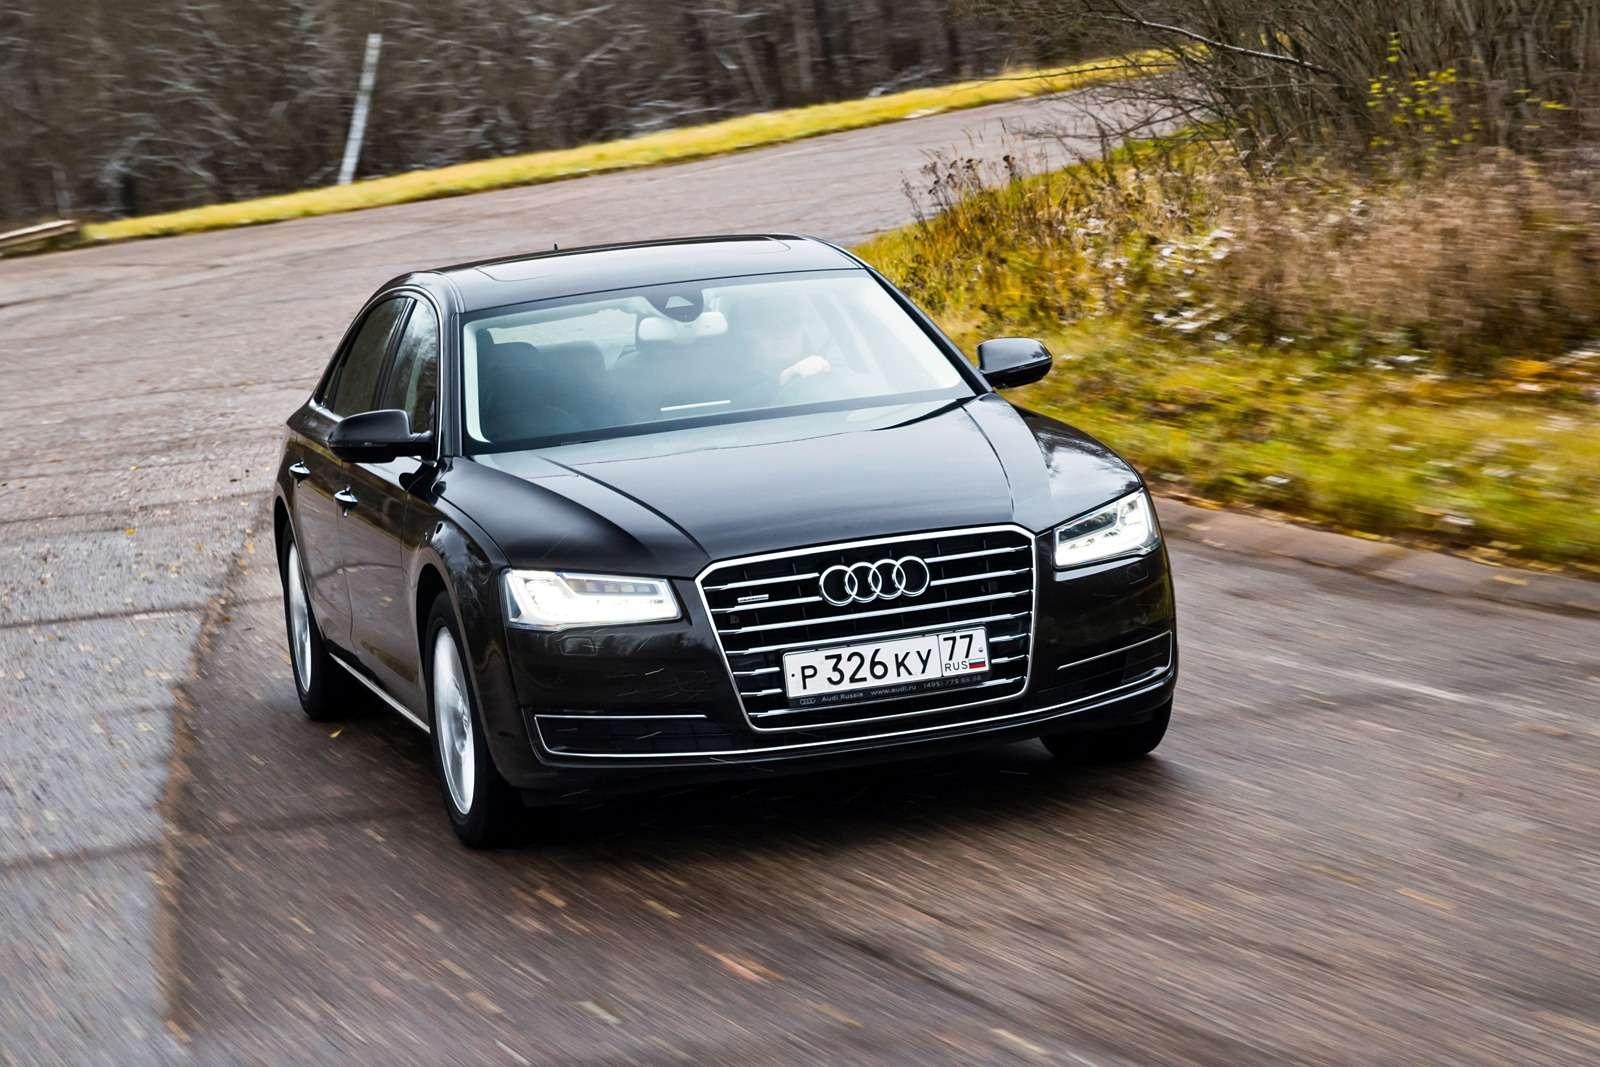 00-Audi_zr-01_16